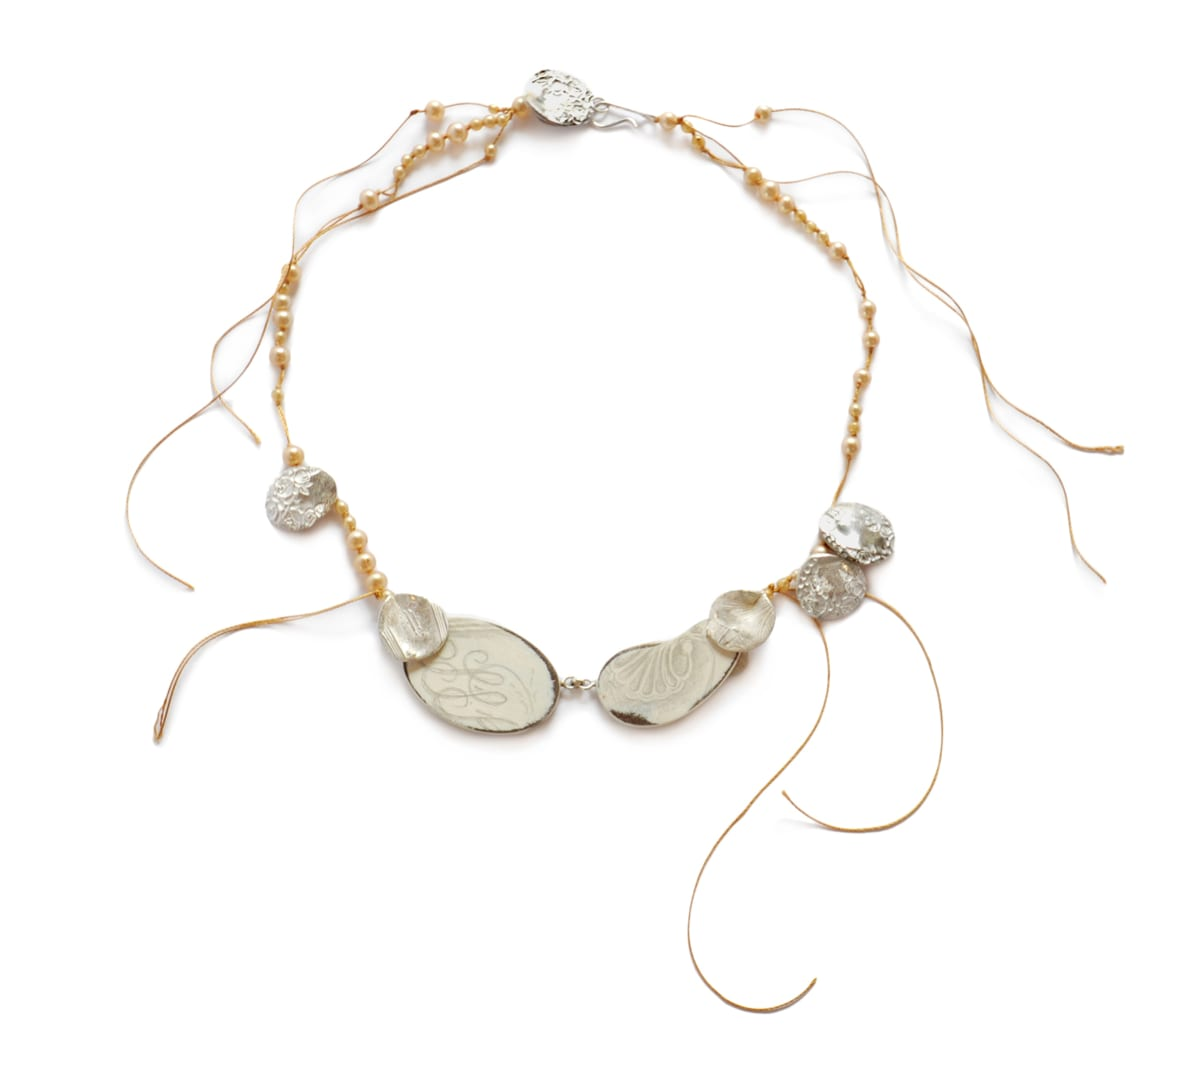 Heidi Lowe, Lineage Necklace , 2017